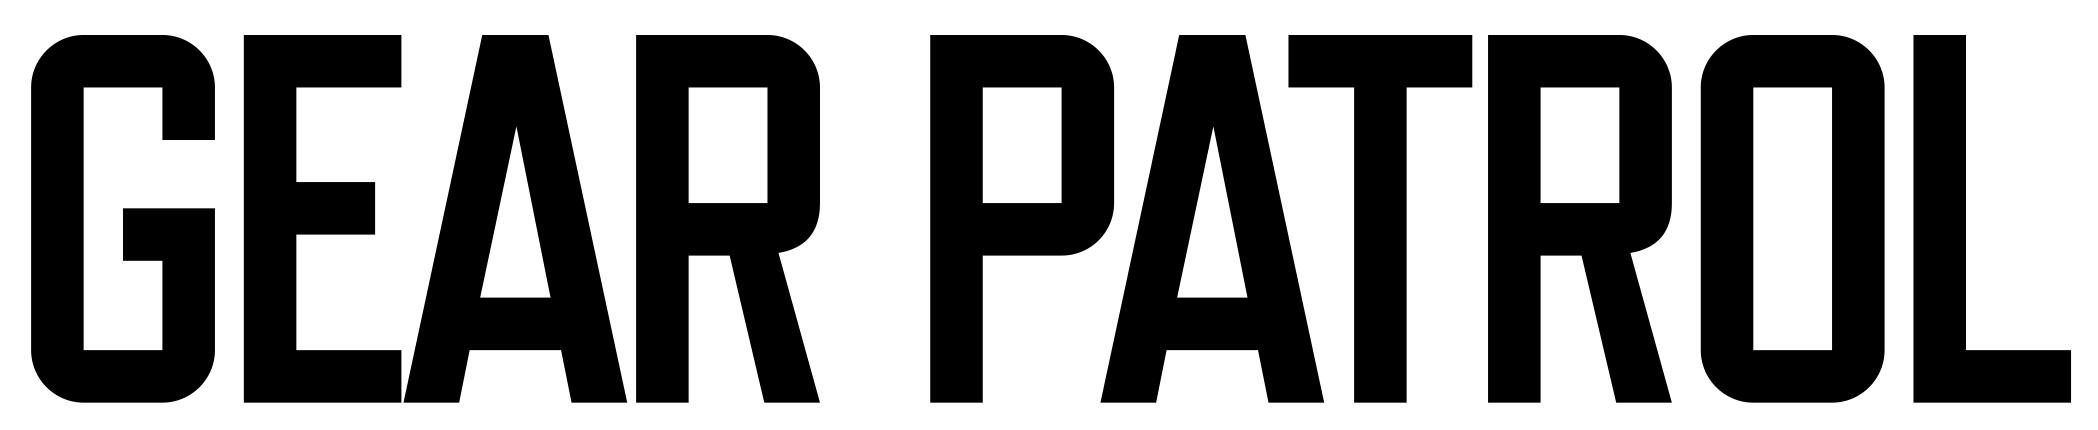 gearpatrol-logo.png